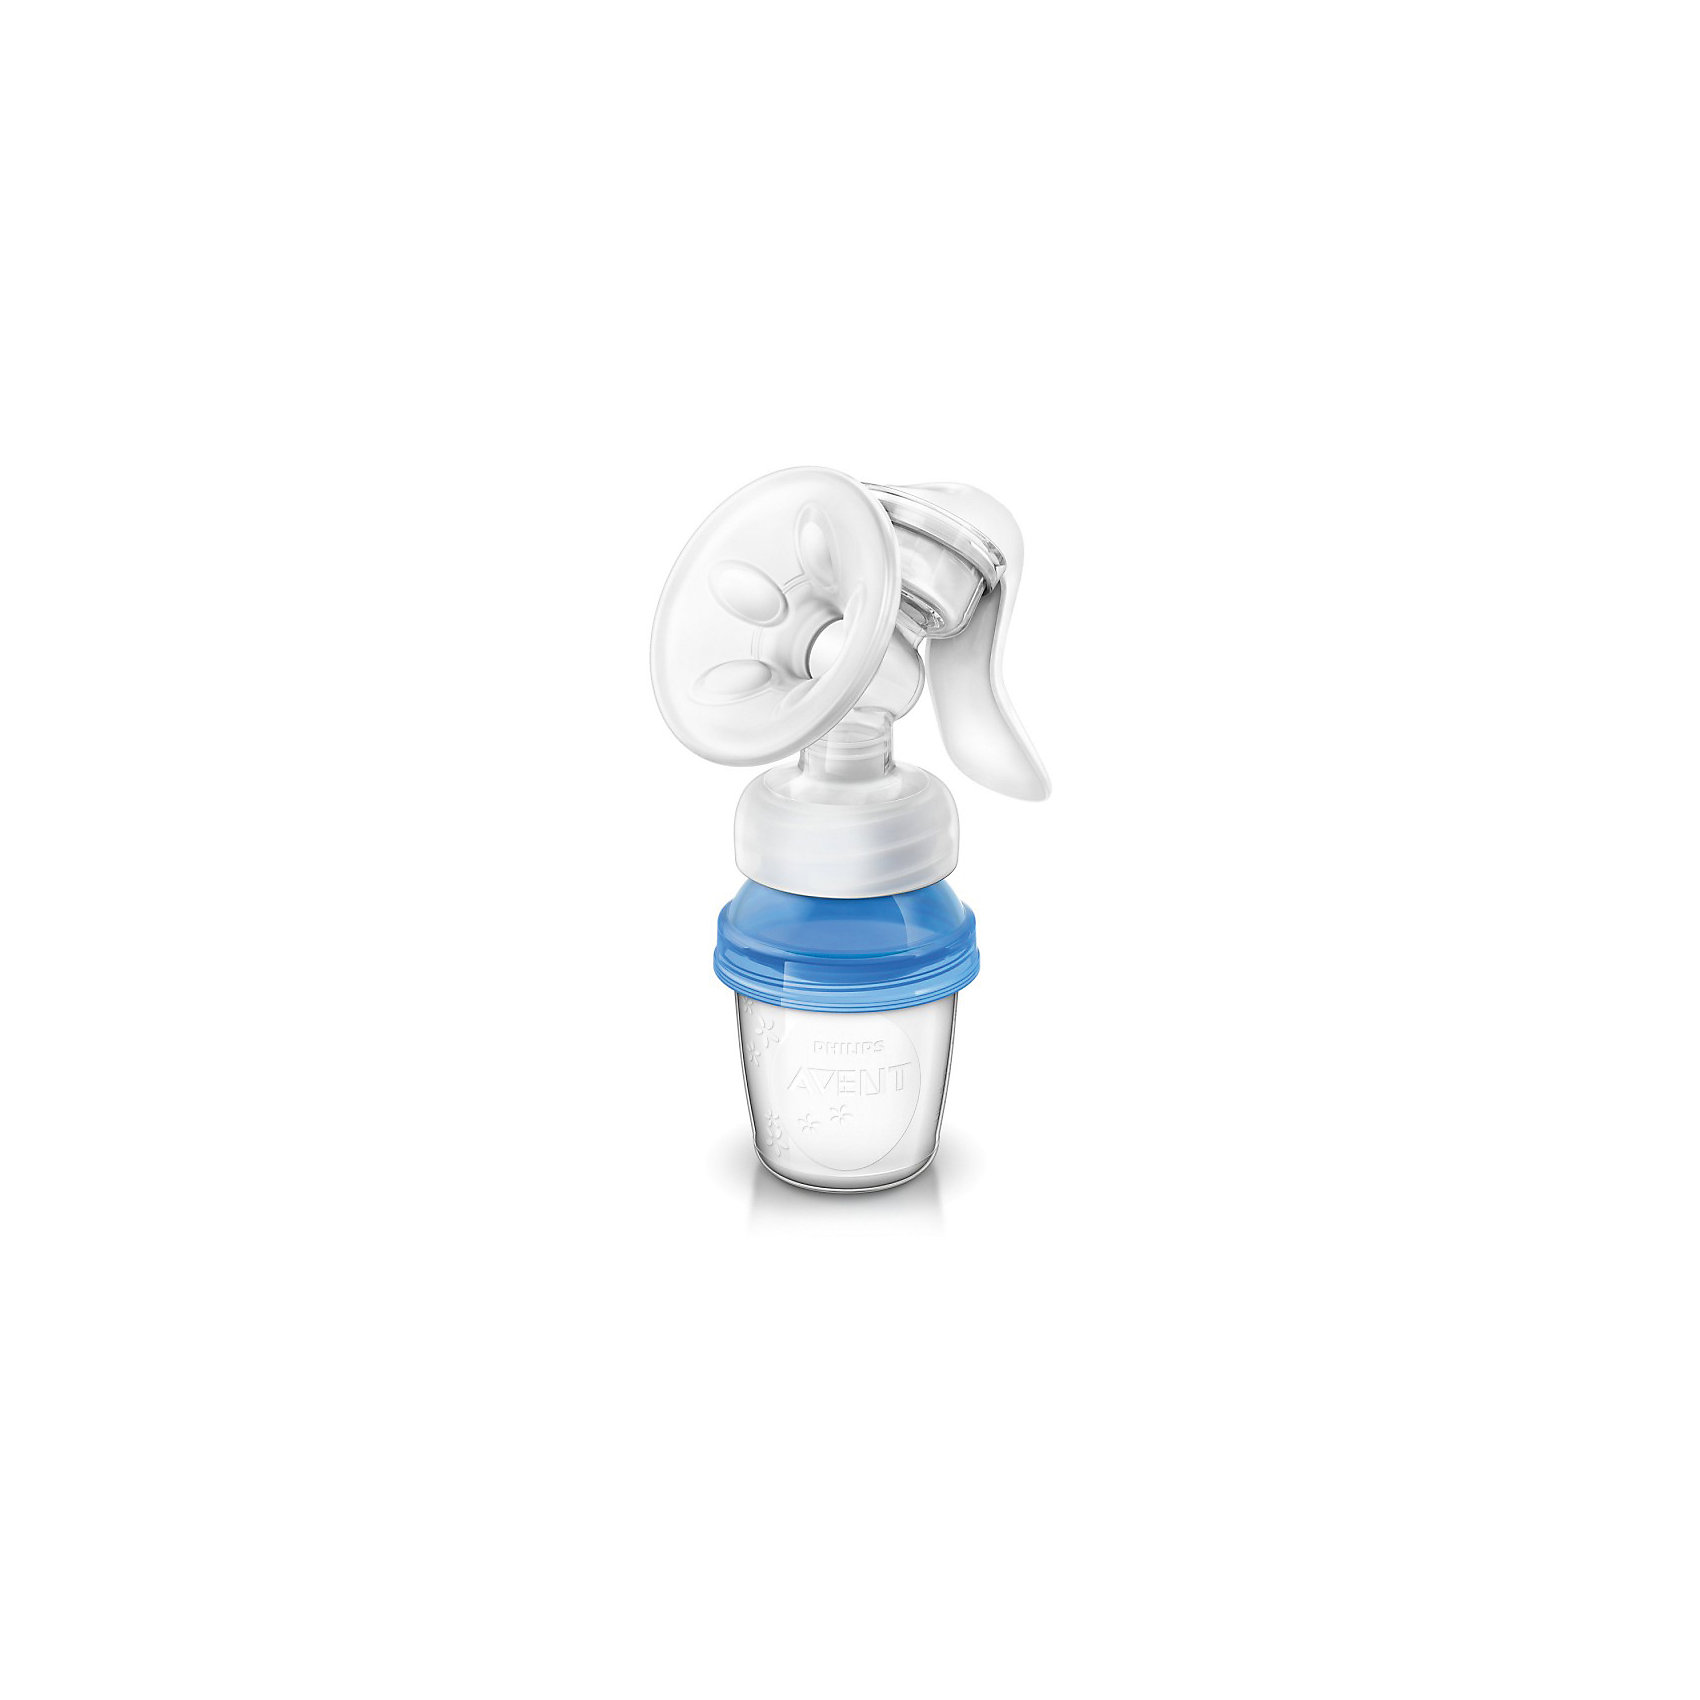 Ручной молокоотсос Natural, Philips Avent